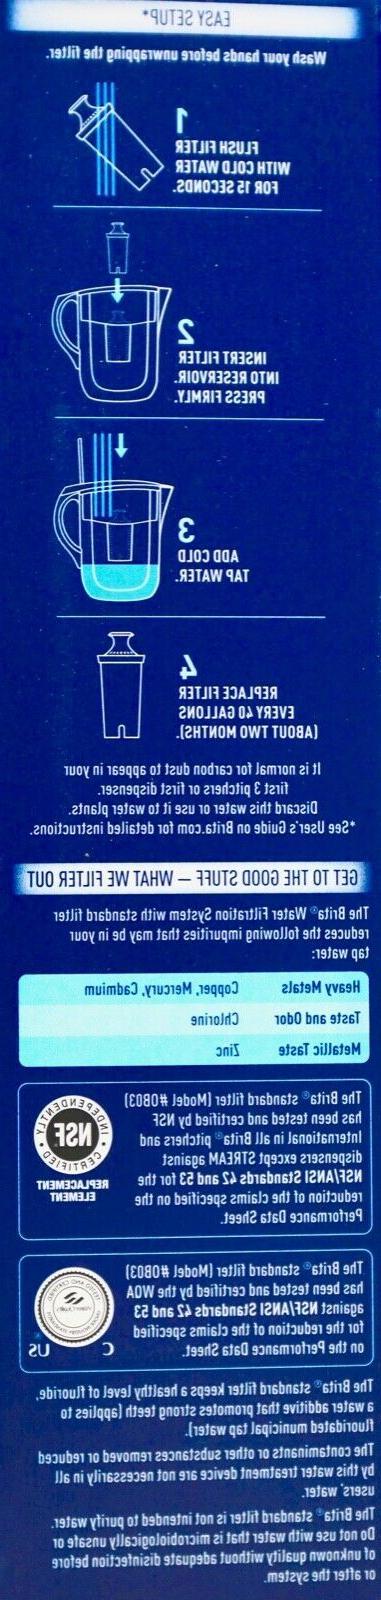 Brita Pitcher Replacement Filters 40 Gallon Refill,